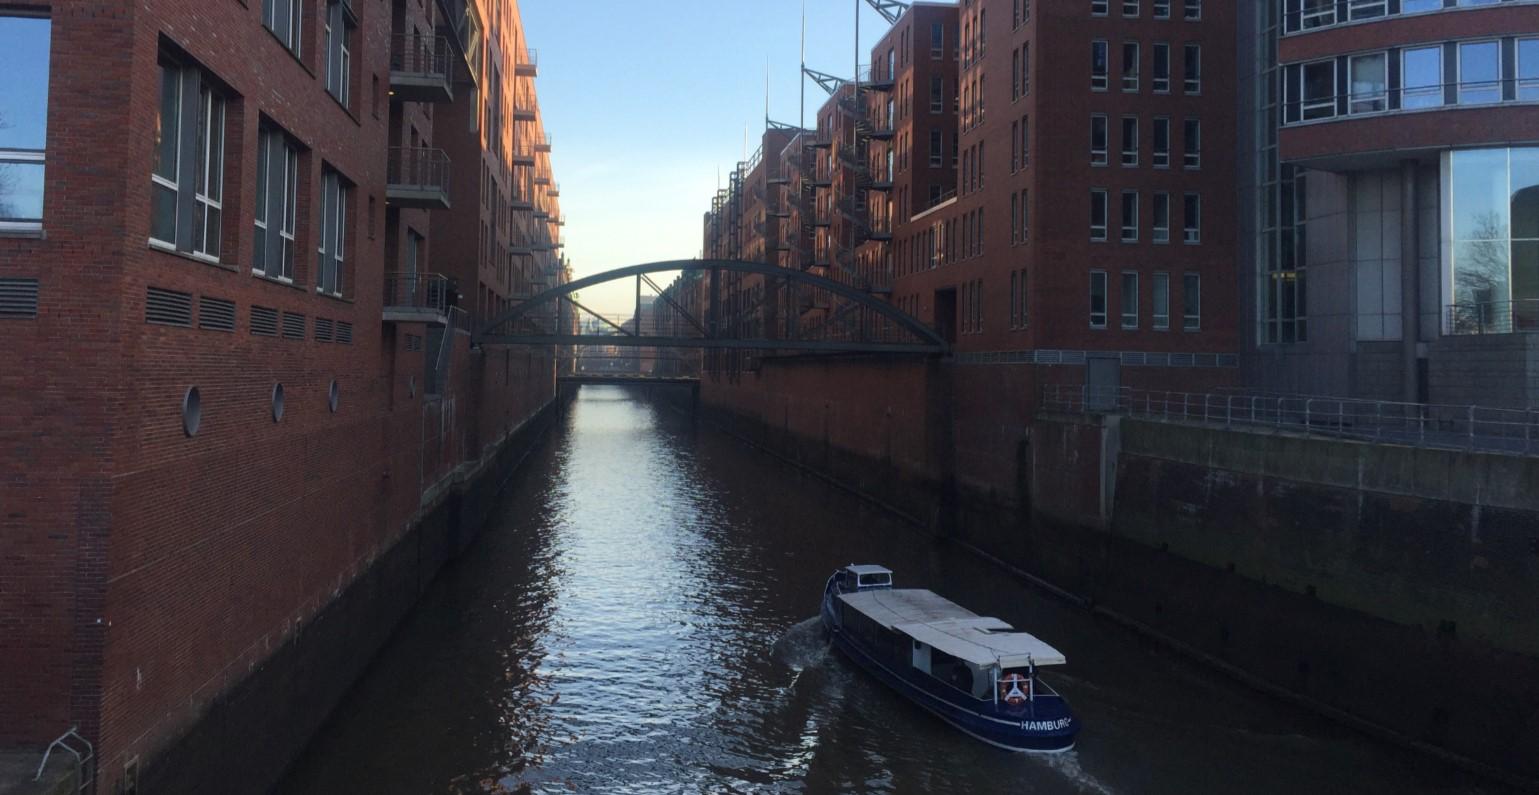 hamburg-canal